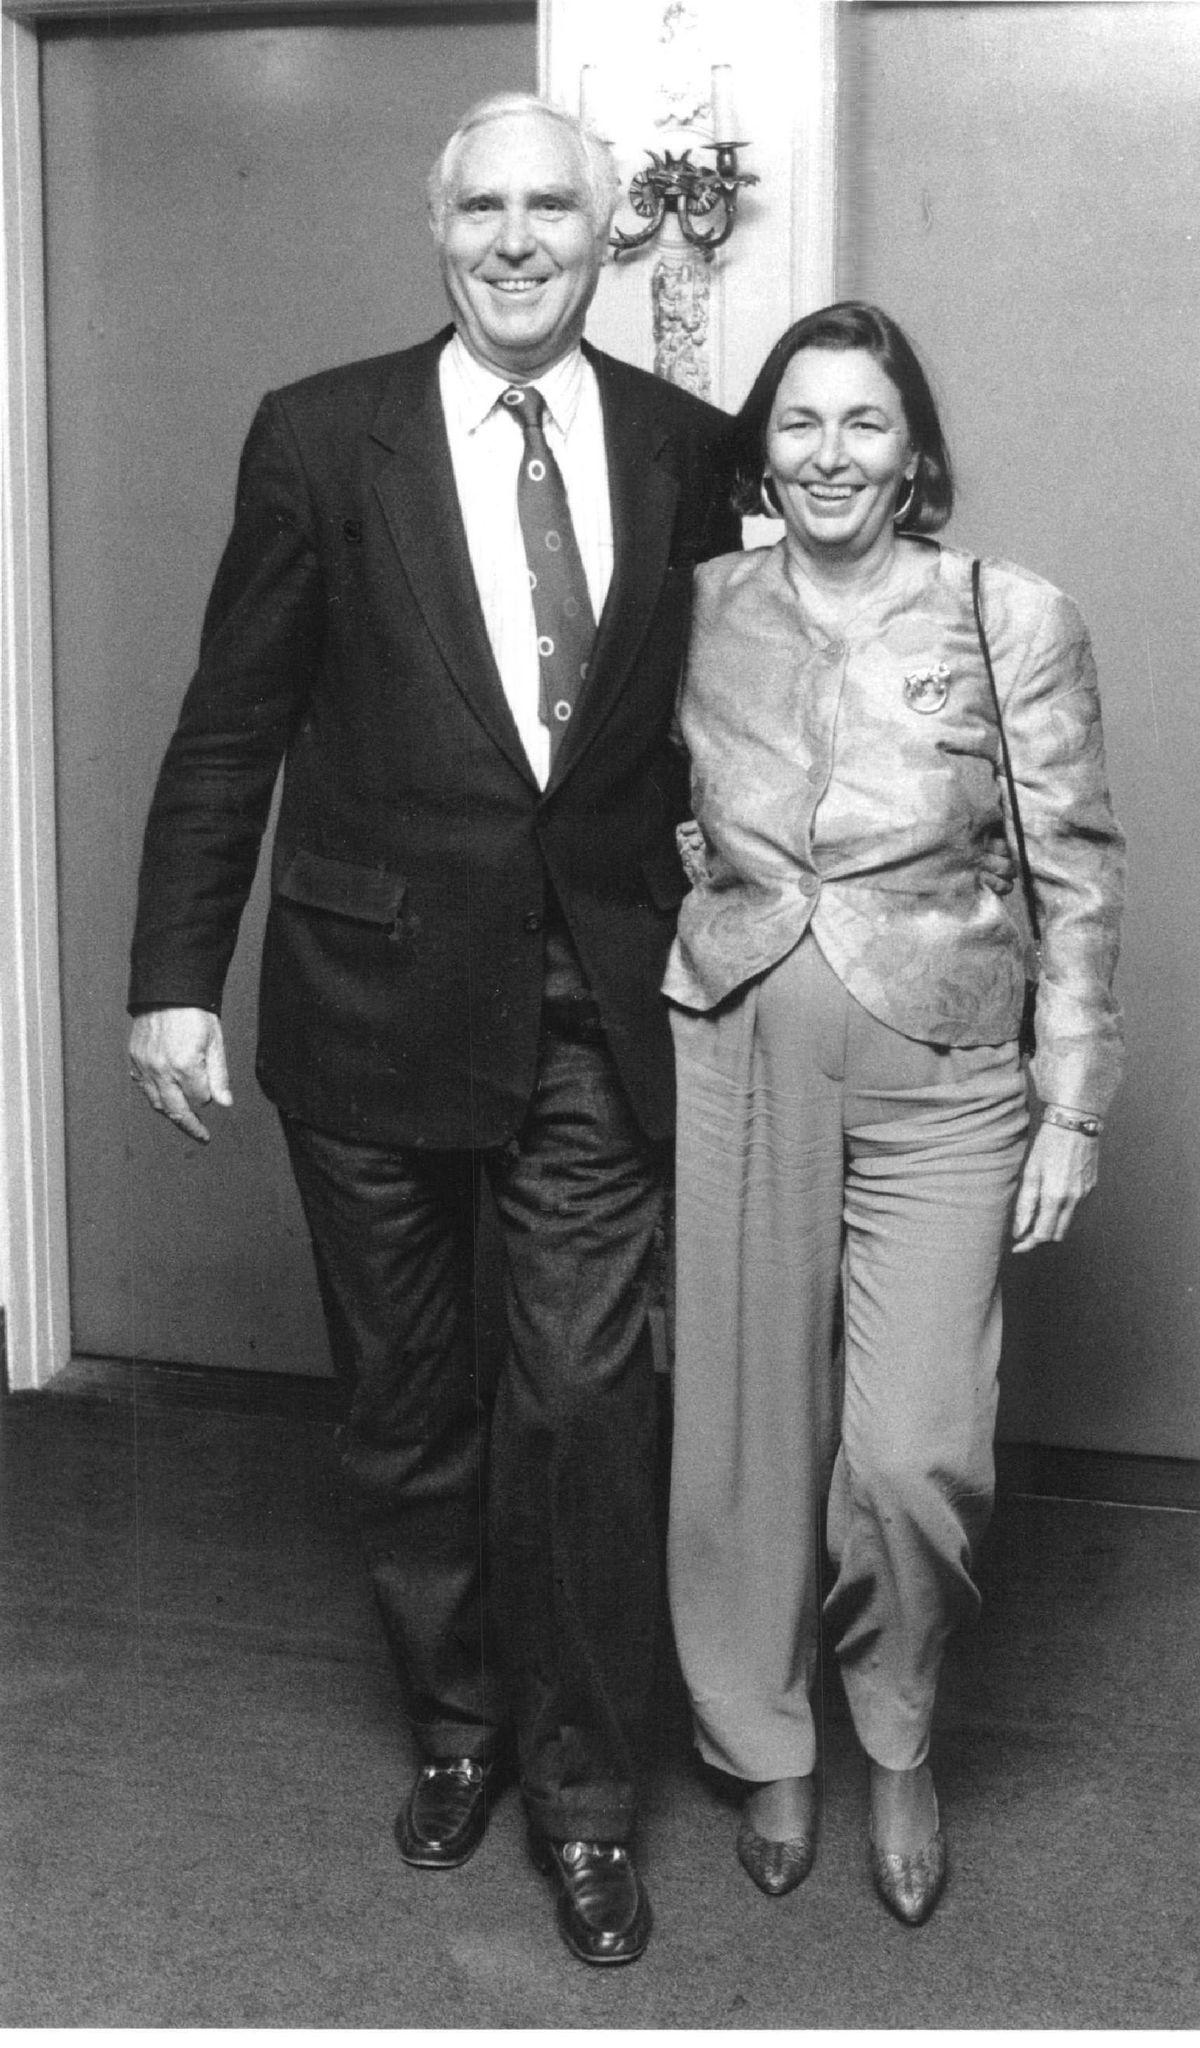 Baron Henry von Ferstel and Marilou Hedlund, shown in 1990.| Sun-Times files